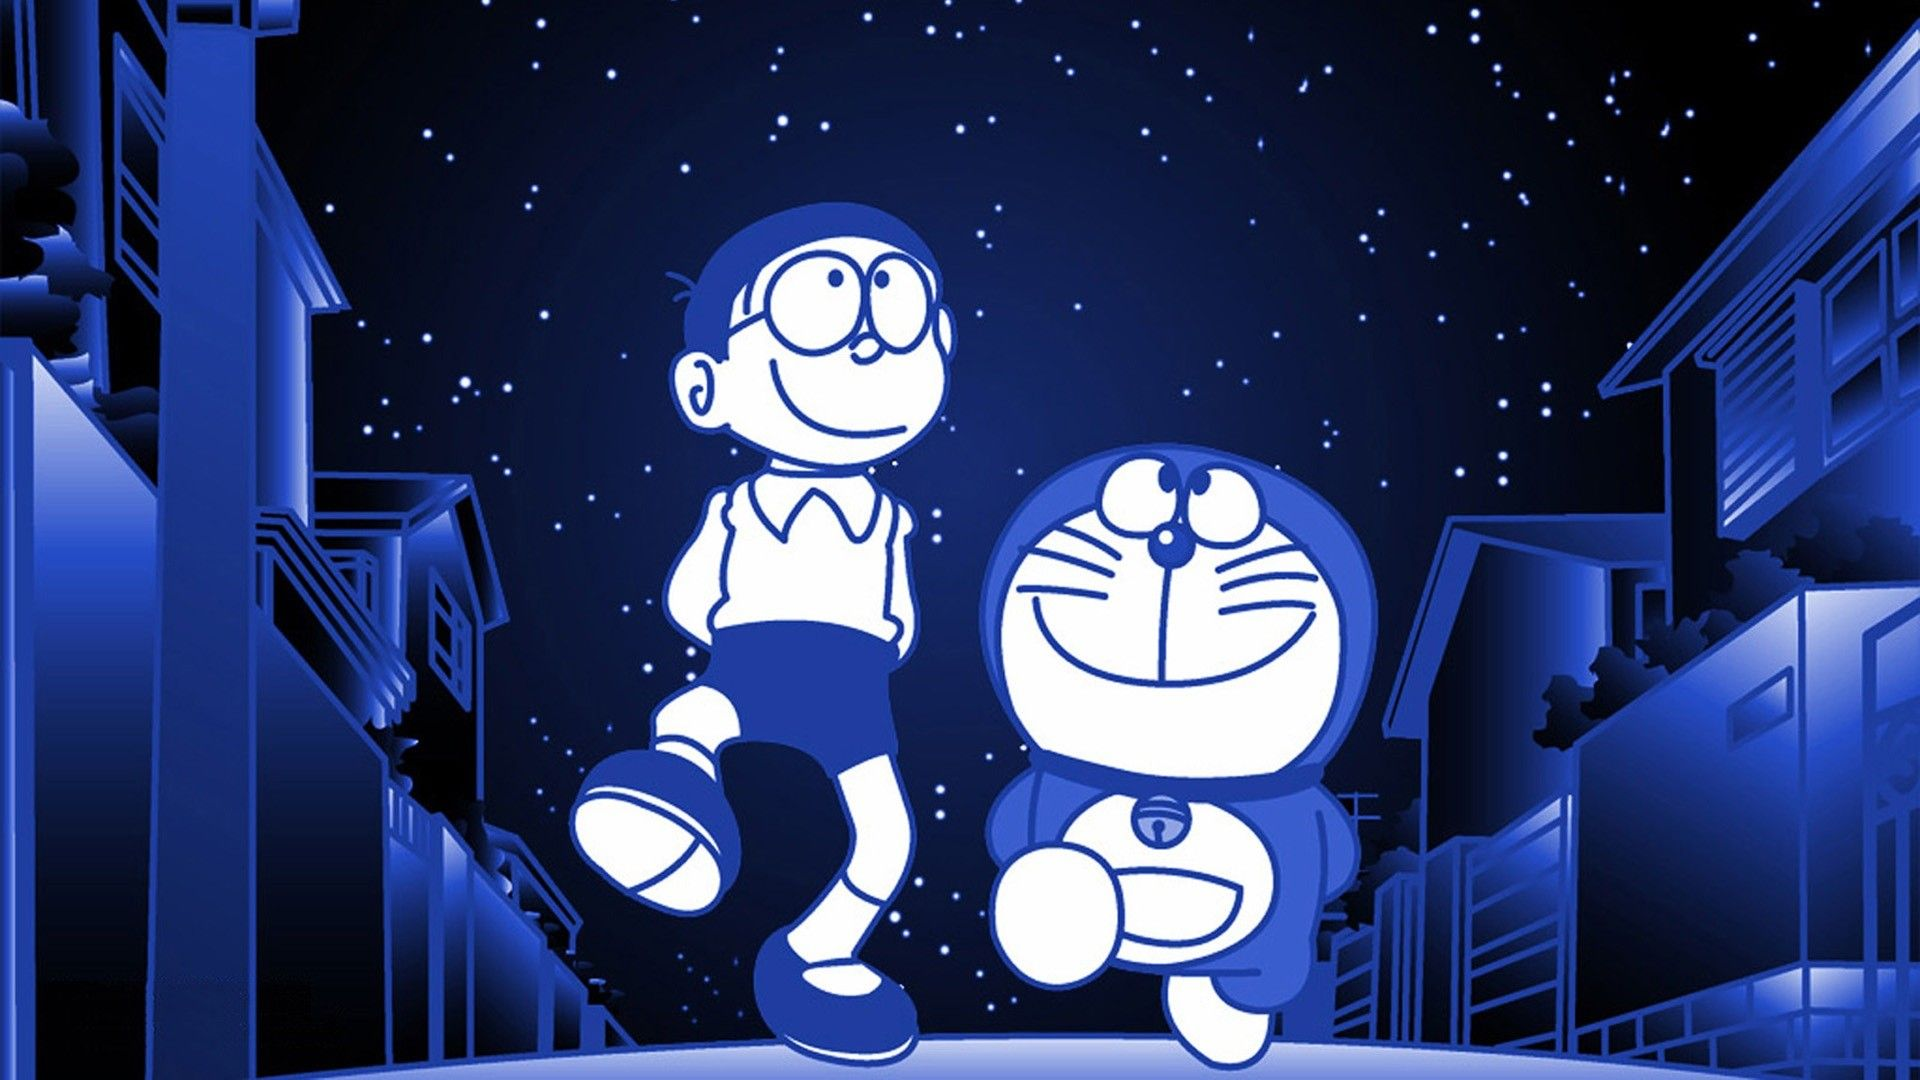 Pin By Rocki On Whoops In 2020 Doraemon Wallpapers Hd Anime Wallpapers Cartoon Wallpaper